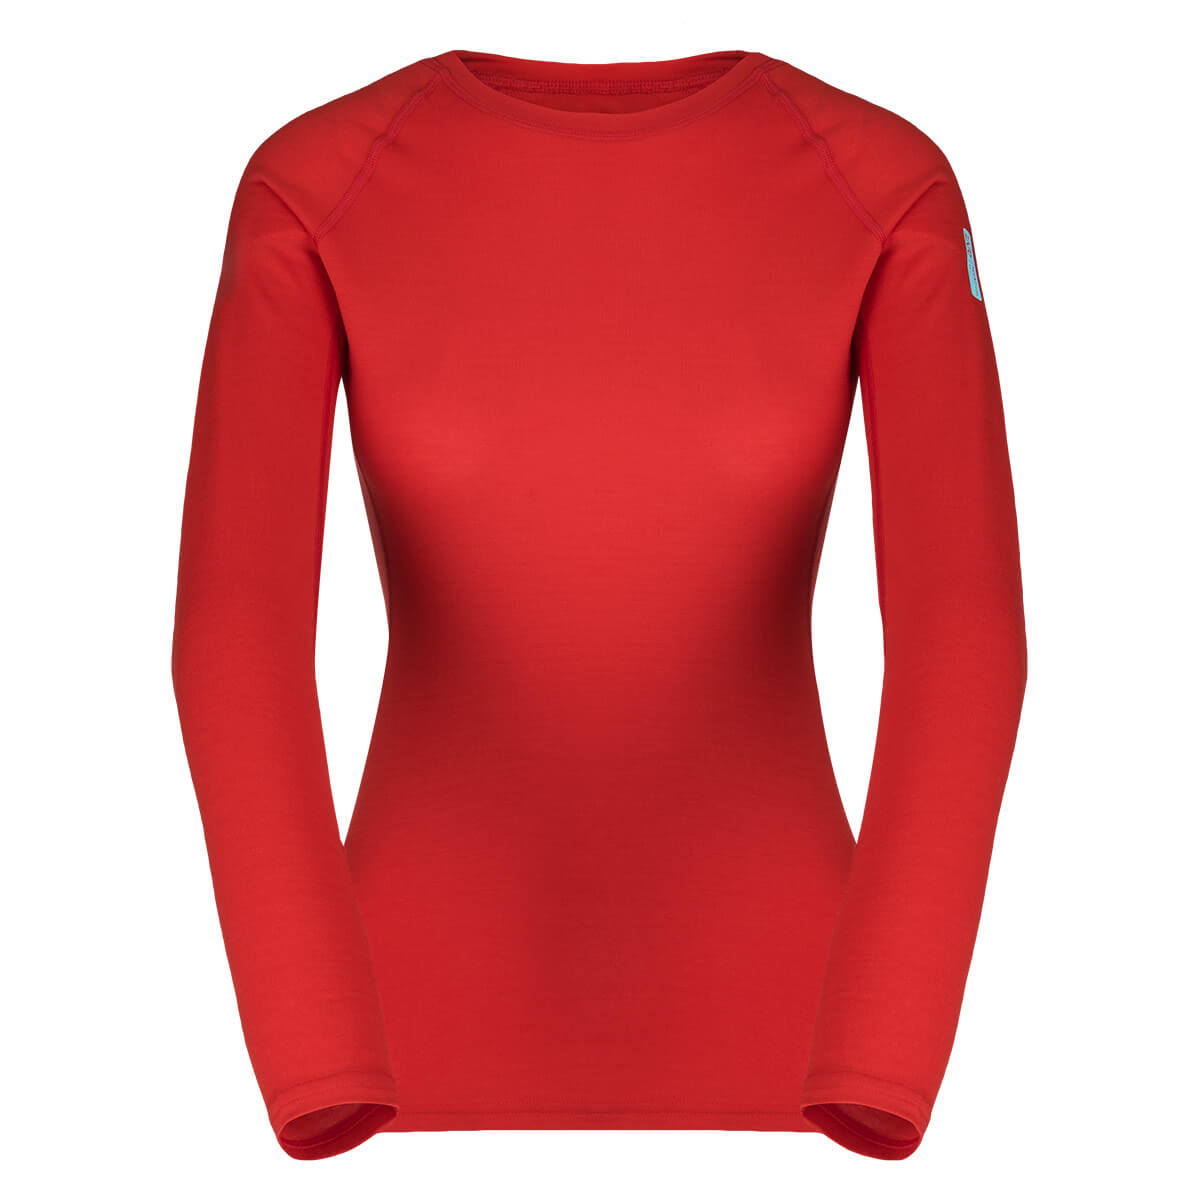 Dámske tričko Zajo Elsa Merino Nylon W T-shirt LS Racing Red - veľkosť XS